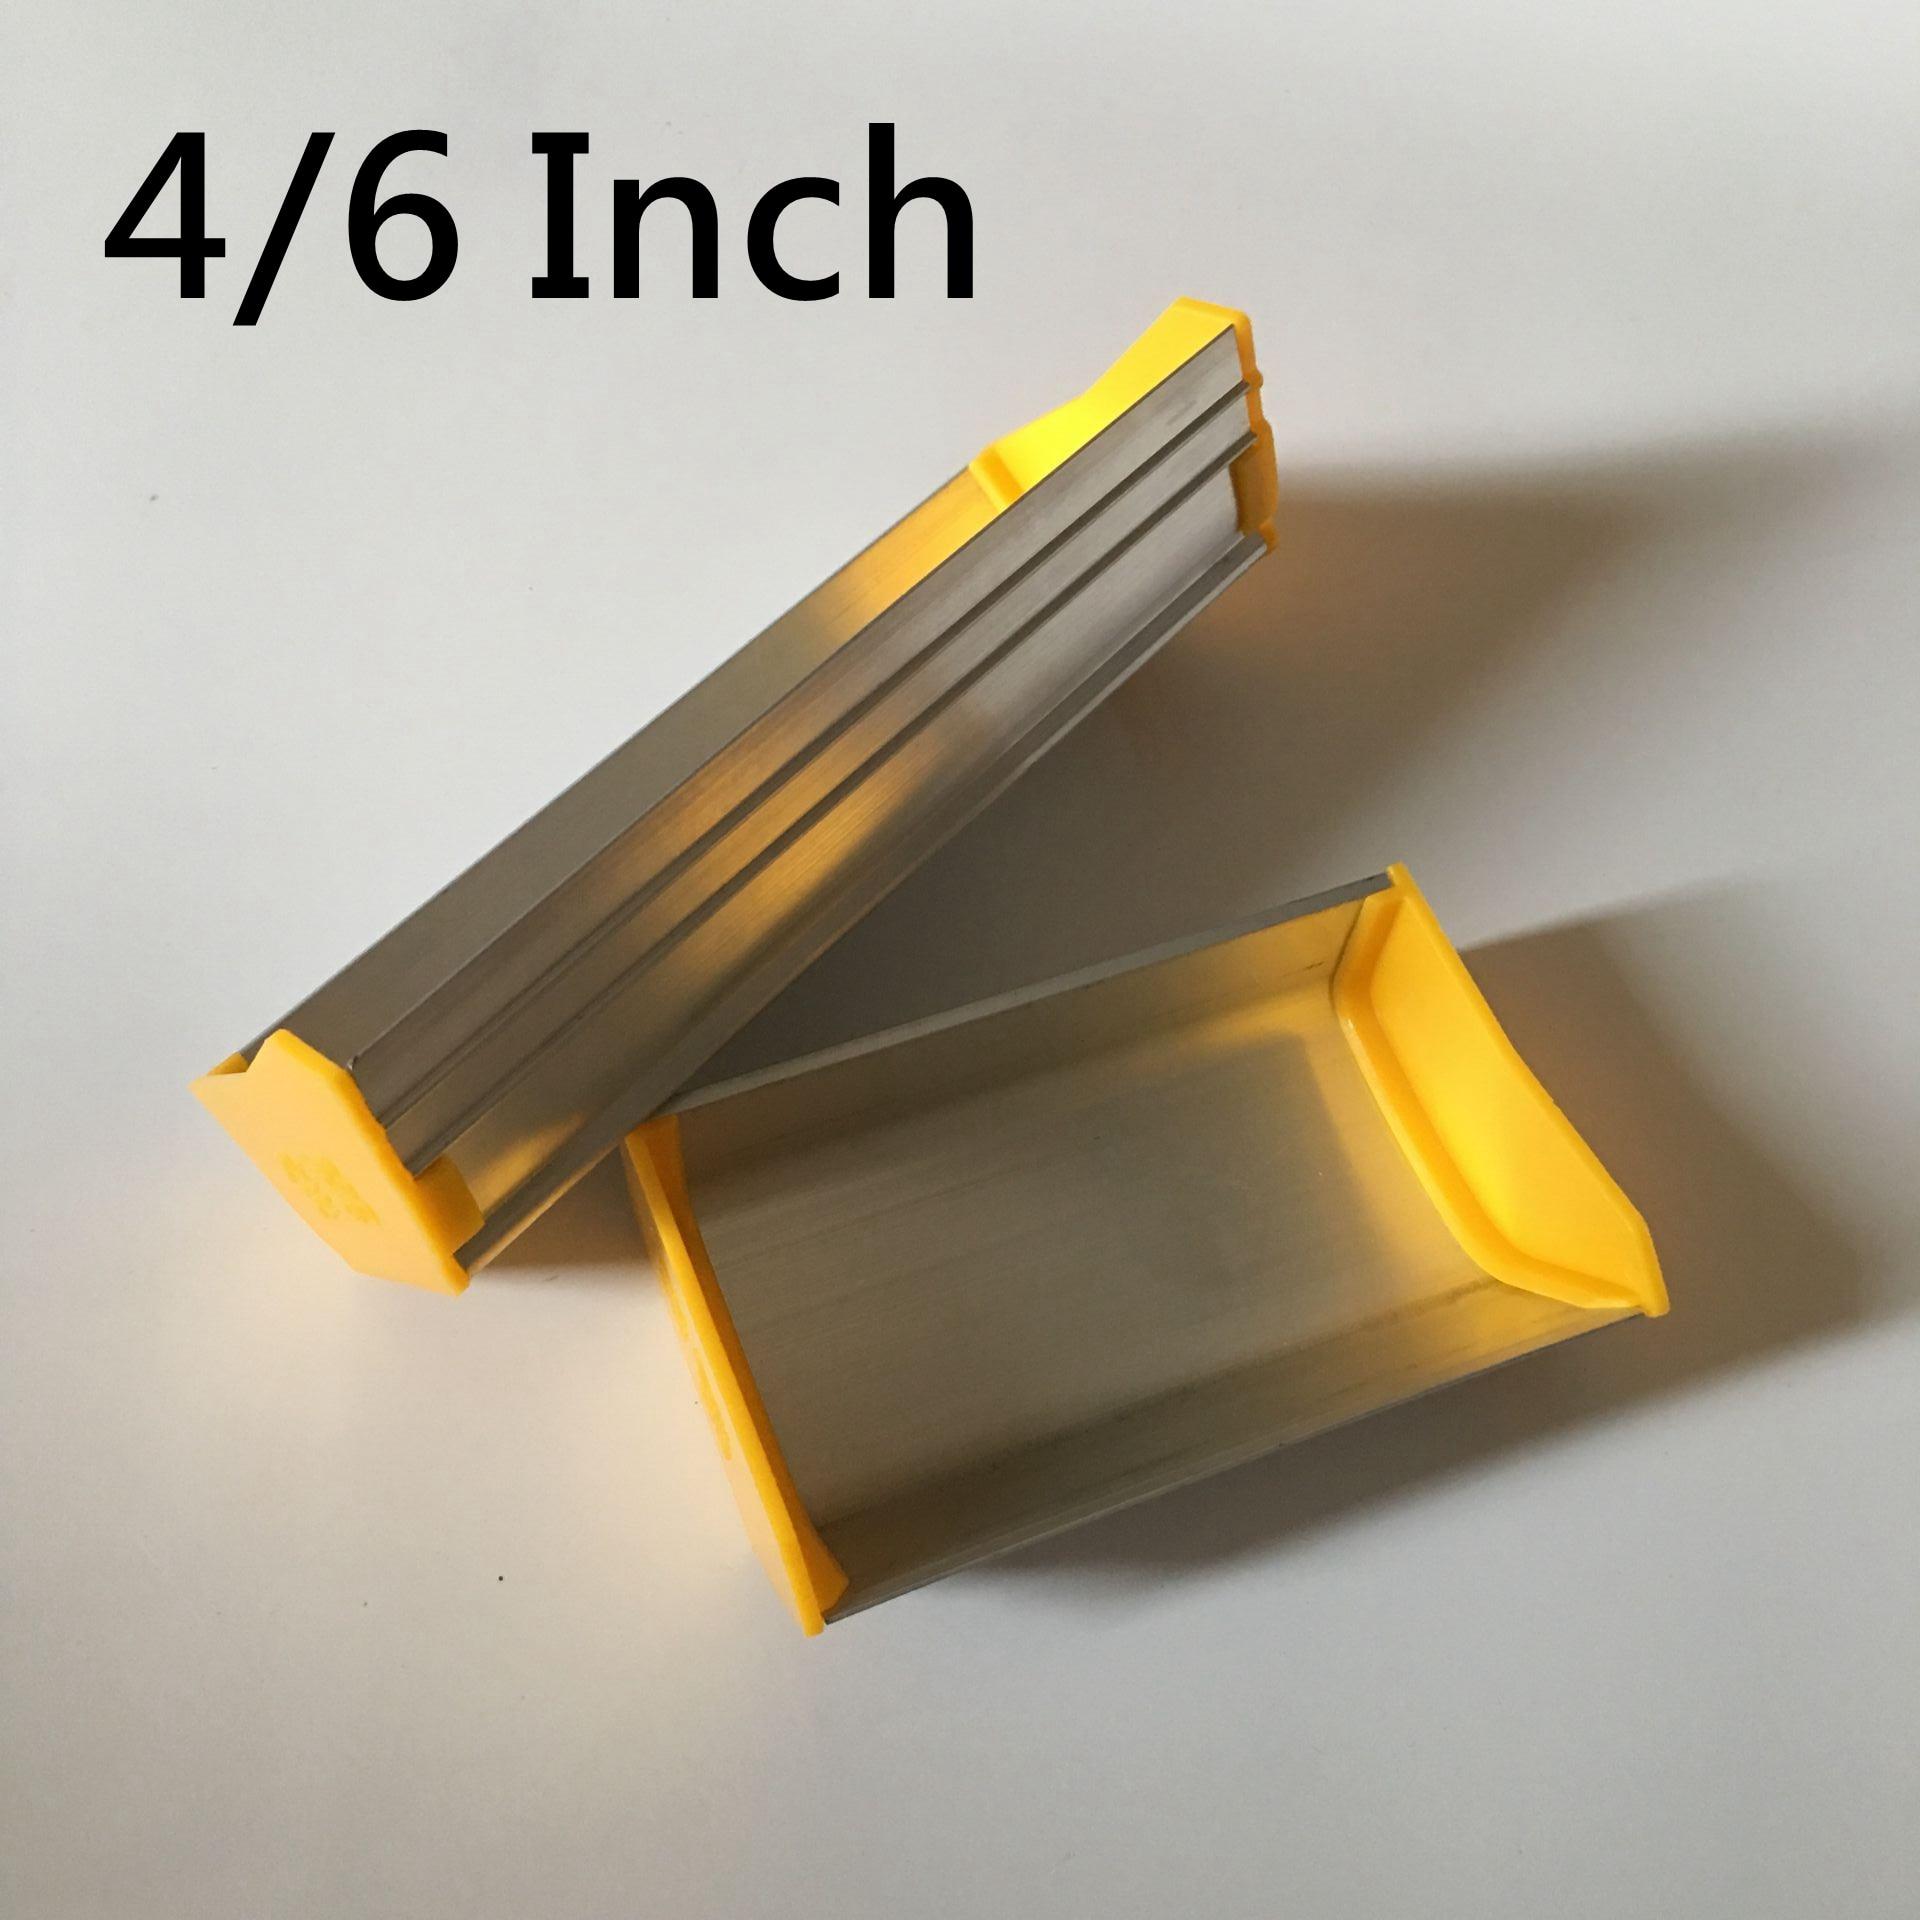 4/6 Inch Screen Printing Aluminum Alloy Emulsion Scoop Coater 11/16CM Silk Screen Printing Sizing Scrape Coating Press Tools